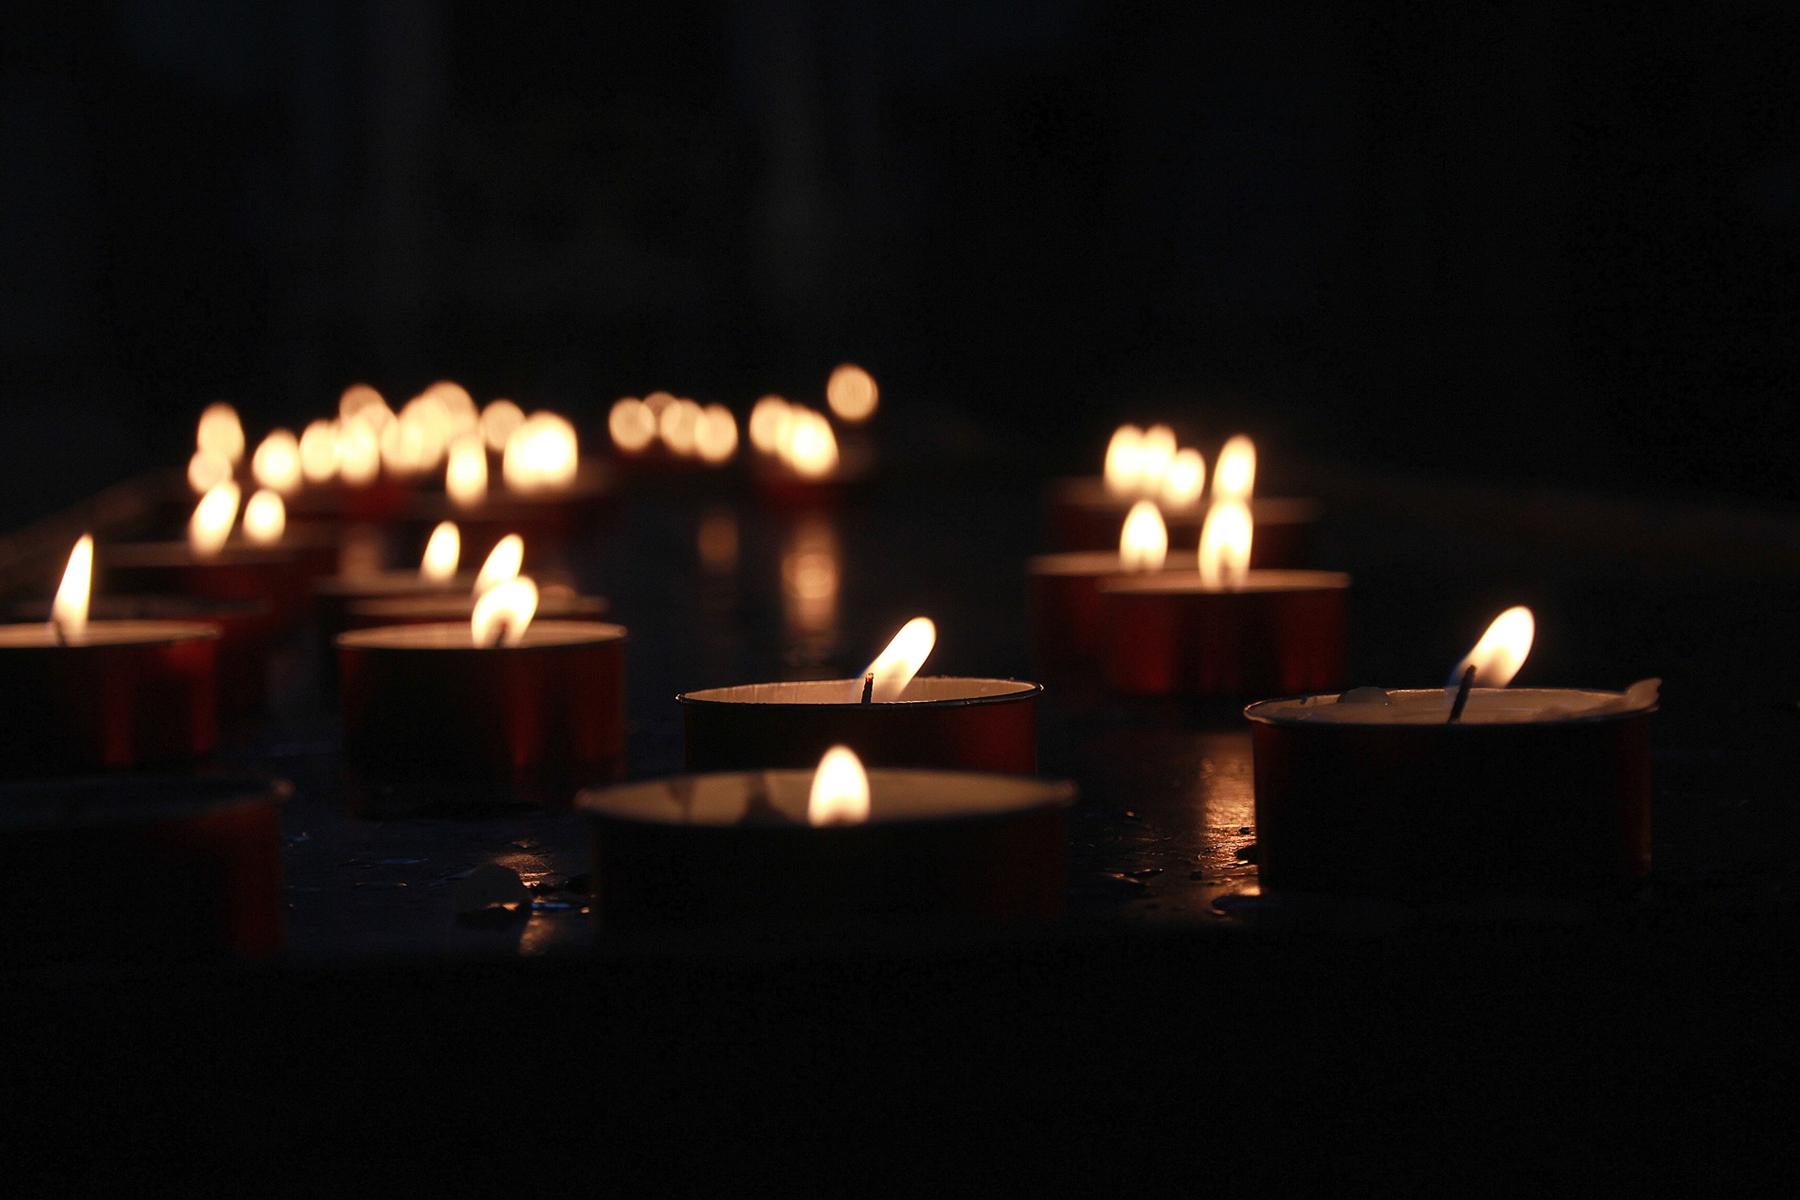 Votive candles illuminate the darkness